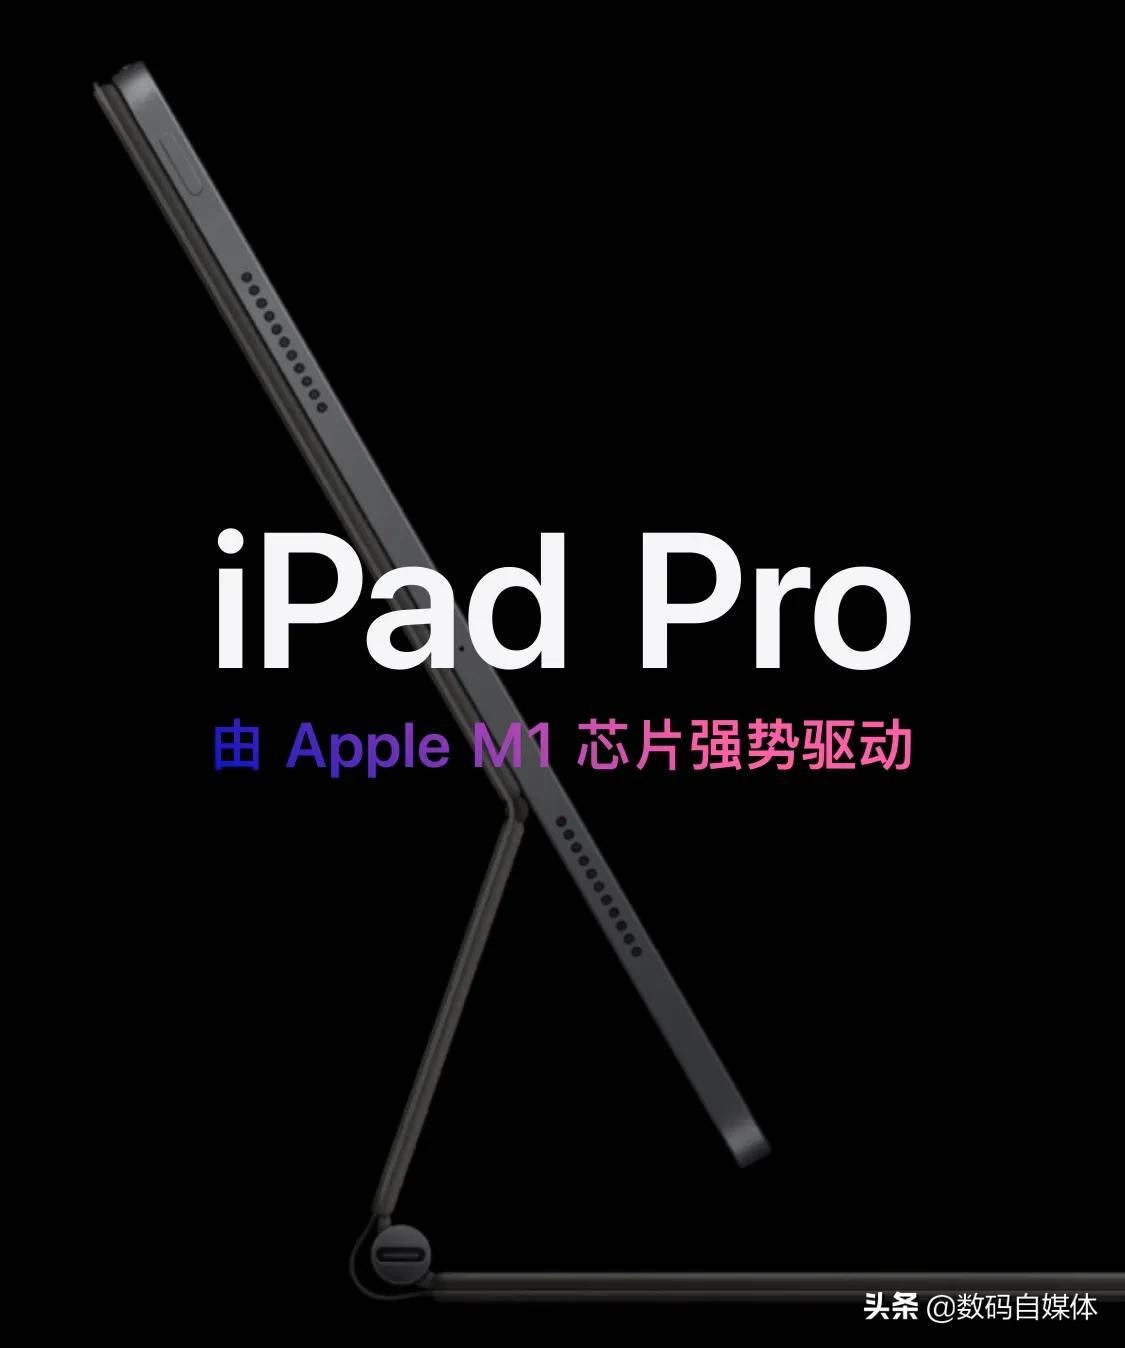 iPad没有适配抖音、淘宝就是没有生产力?荒谬